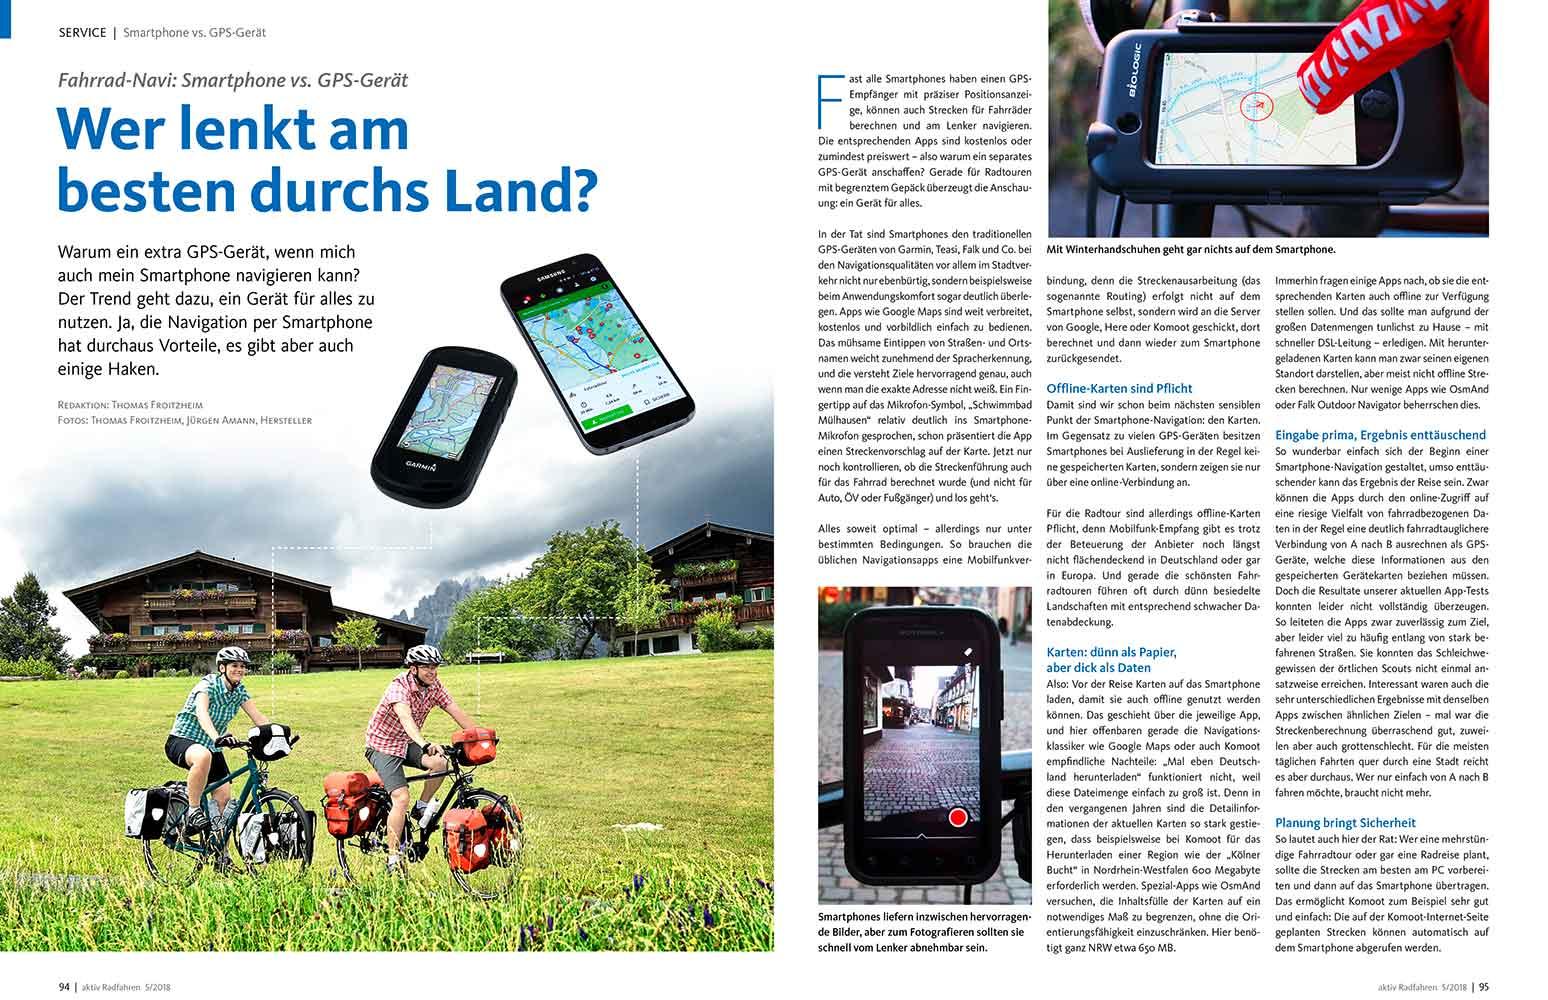 Navigation: GPS-Gerät vs. Smartphone